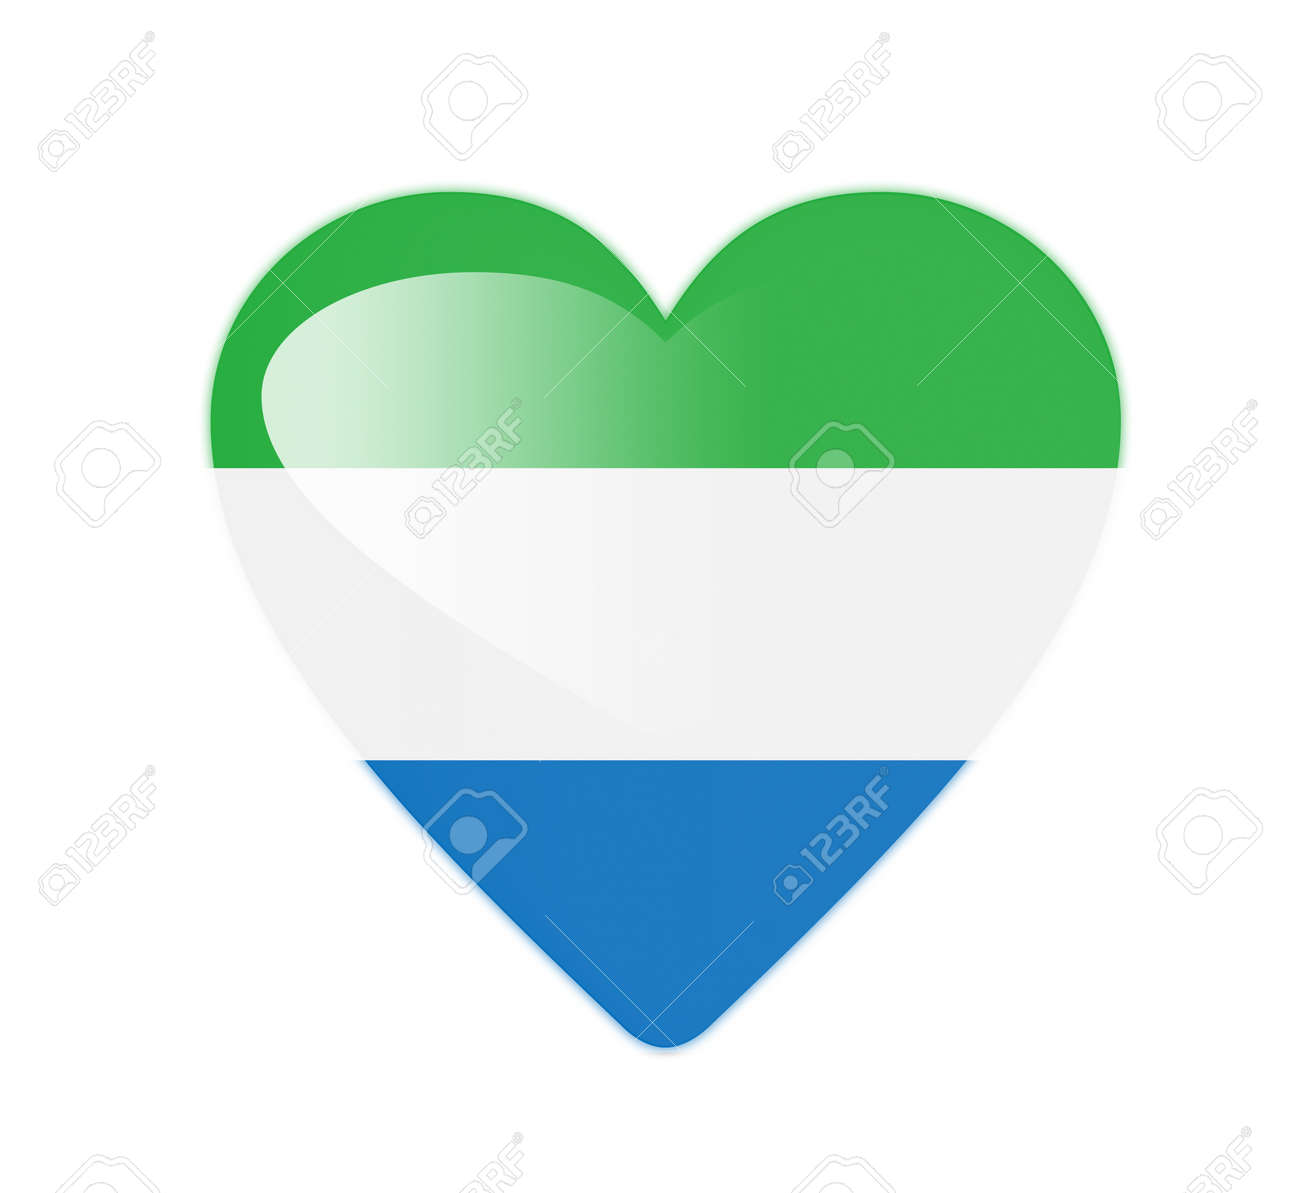 Sierra Leone 3D heart shaped flag Stock Photo - 13245760